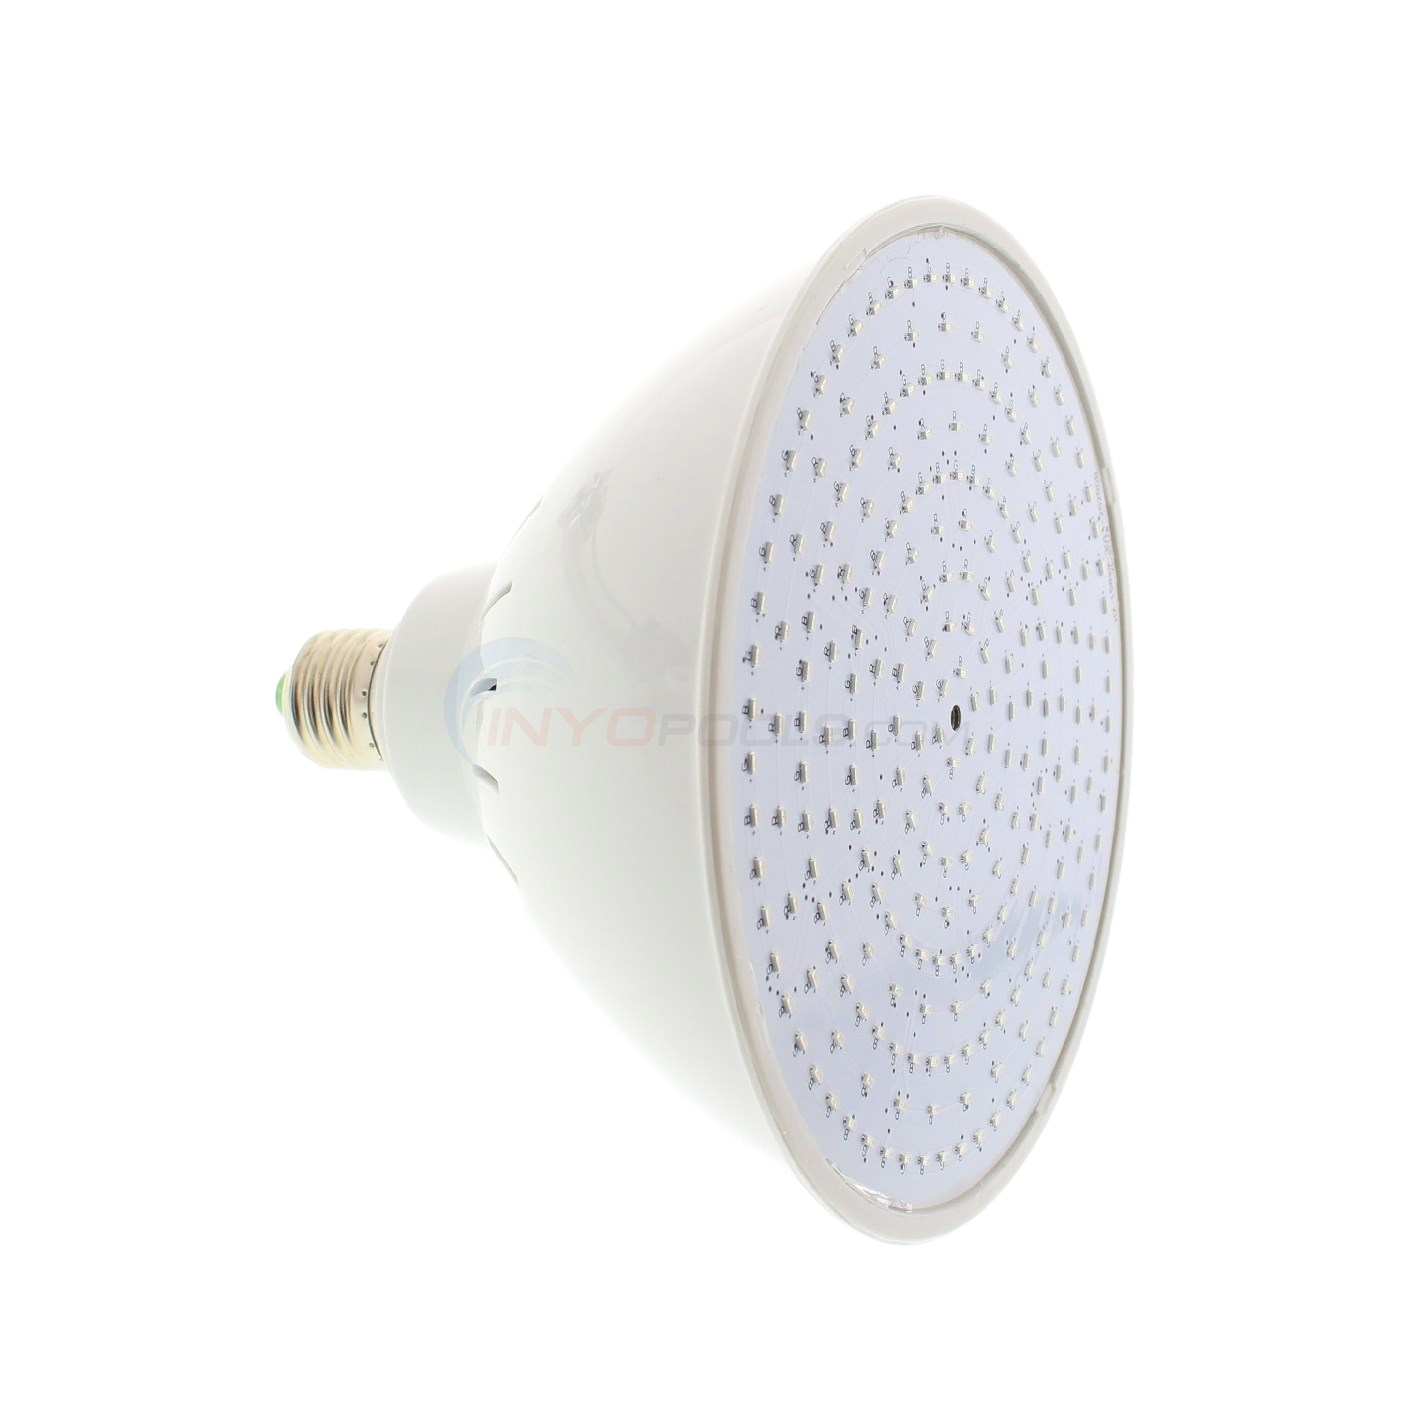 PureLine LED Pool Bulb Color Changing 120V 18W